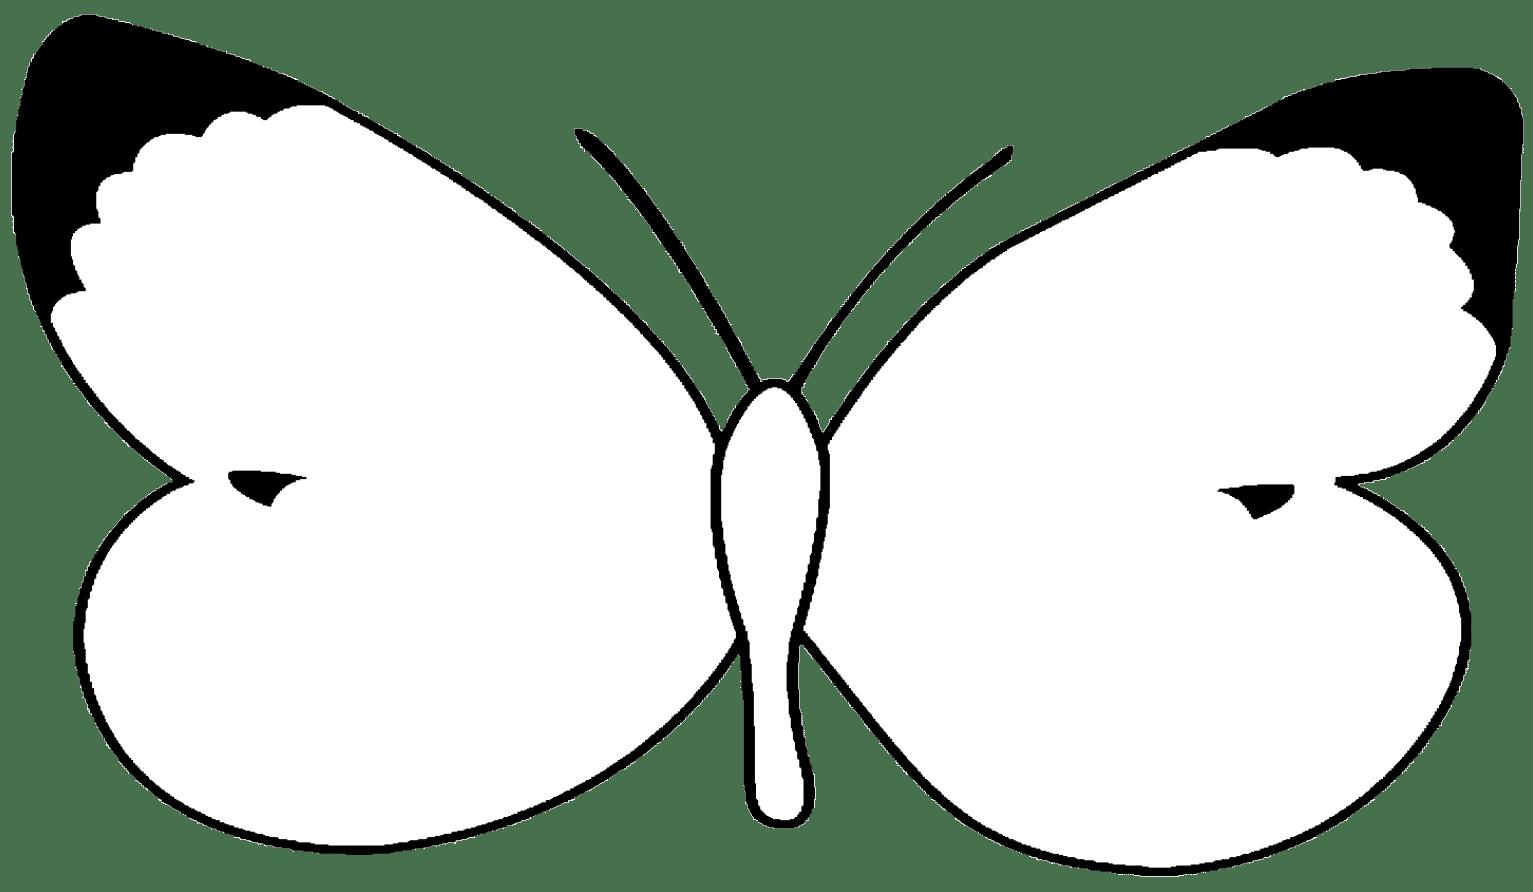 logo_Het_Koolwitje_vrij